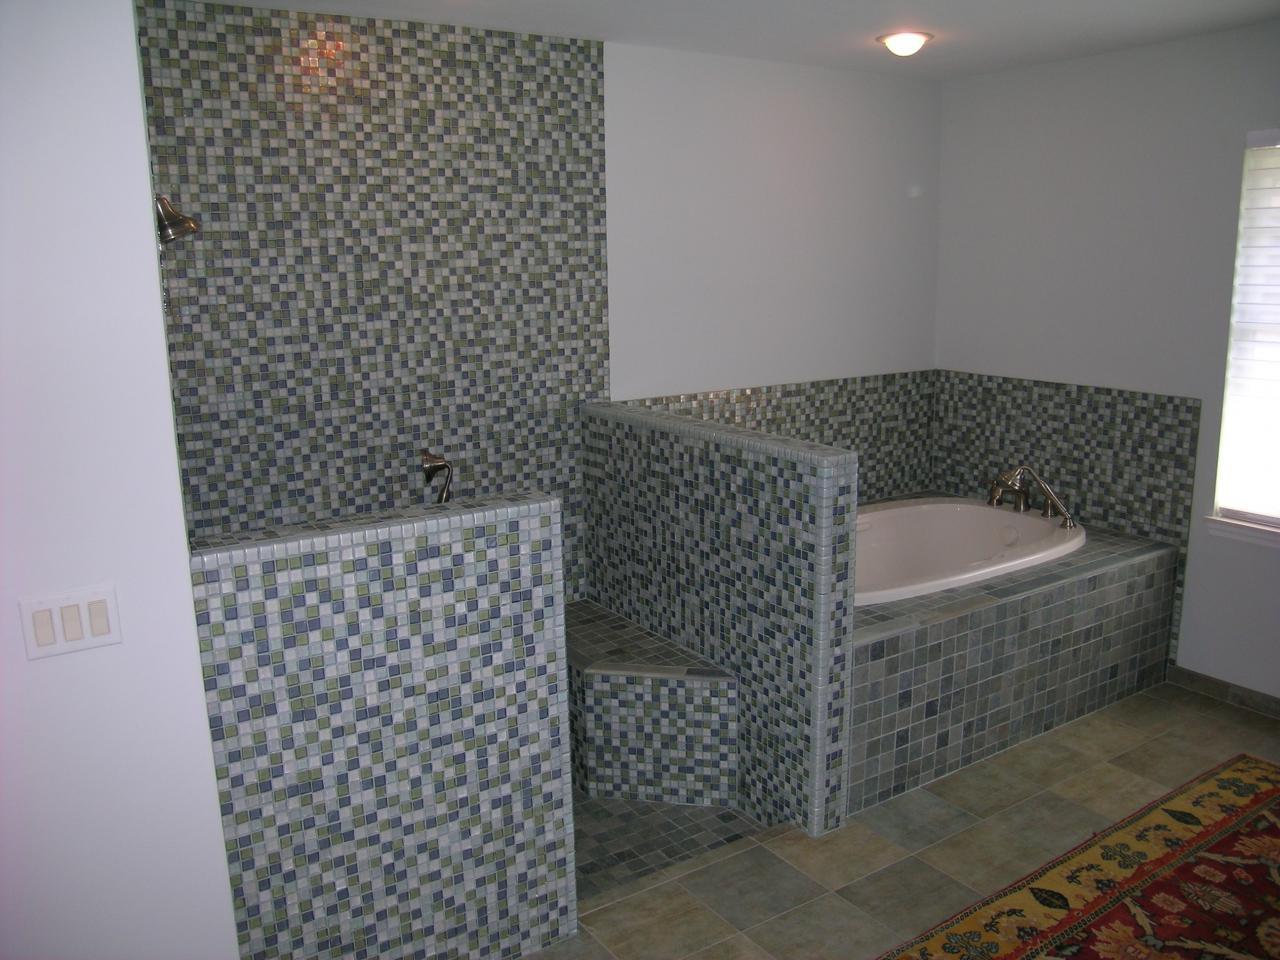 Tubs and tiles bathrooms bathroom tub how to tile around a tub step by step tub bathrooms dailygadgetfo Choice Image